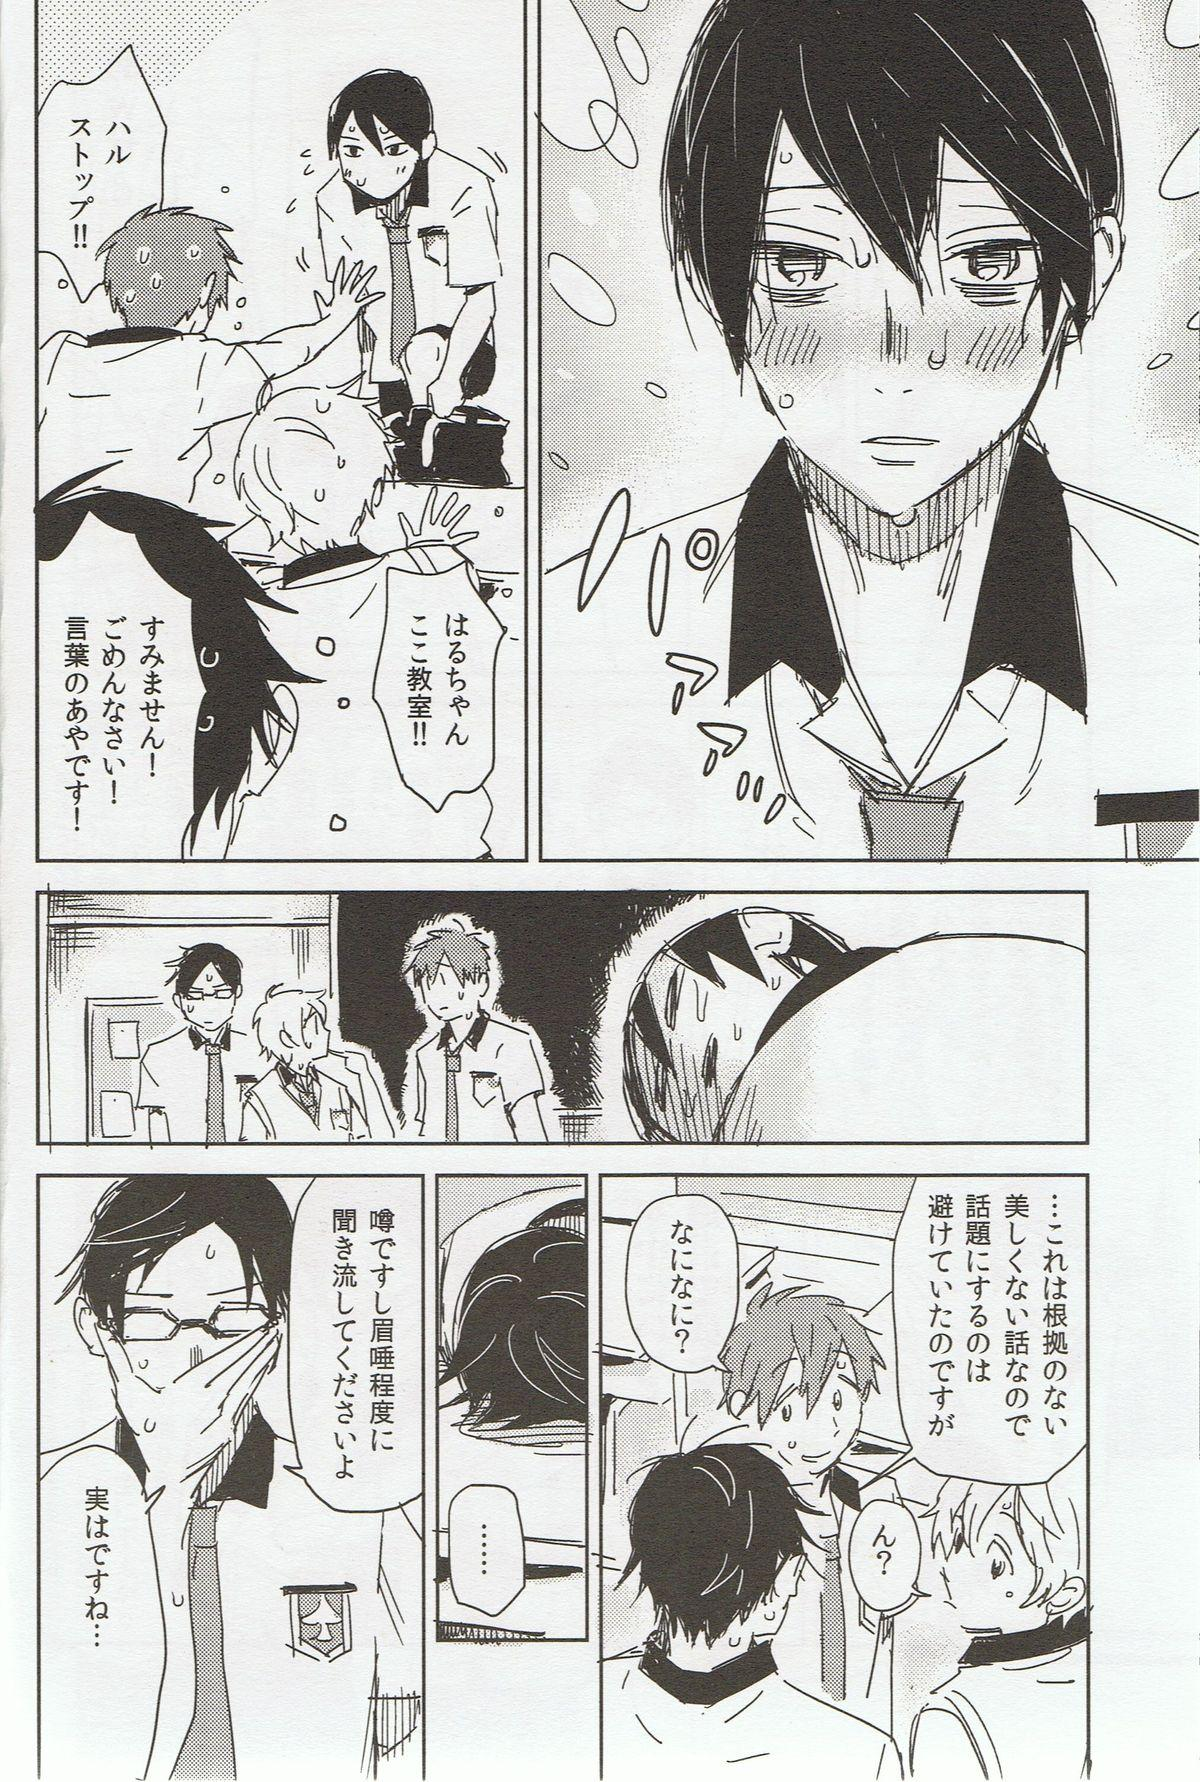 Sou da, Tottori Sakyuu Ikou. 8